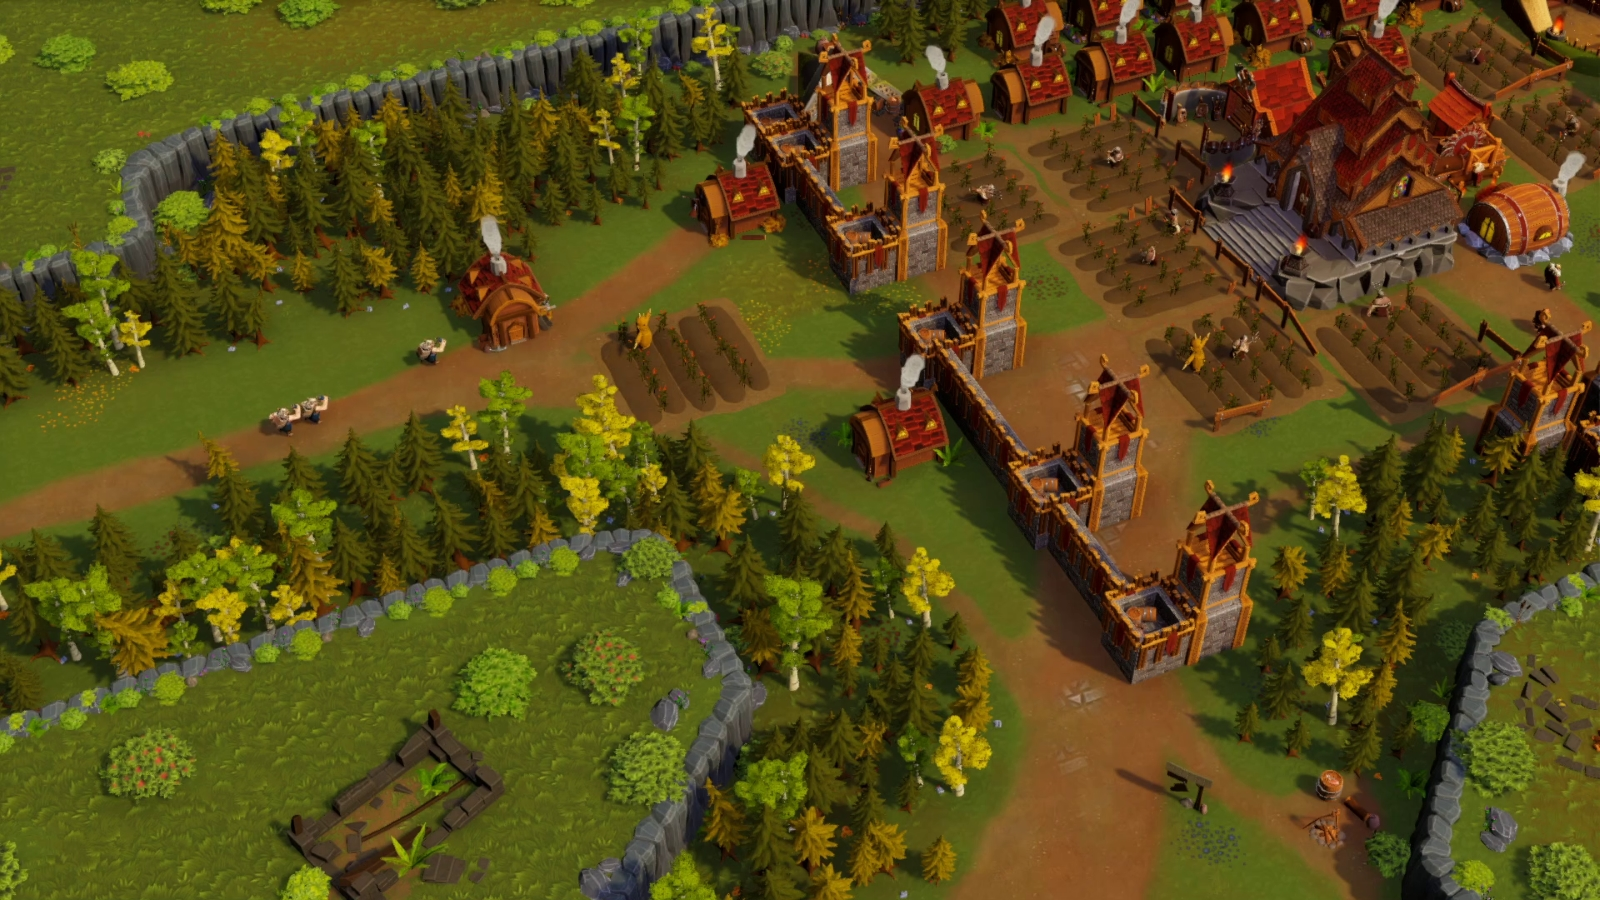 dwarfheim games show 3